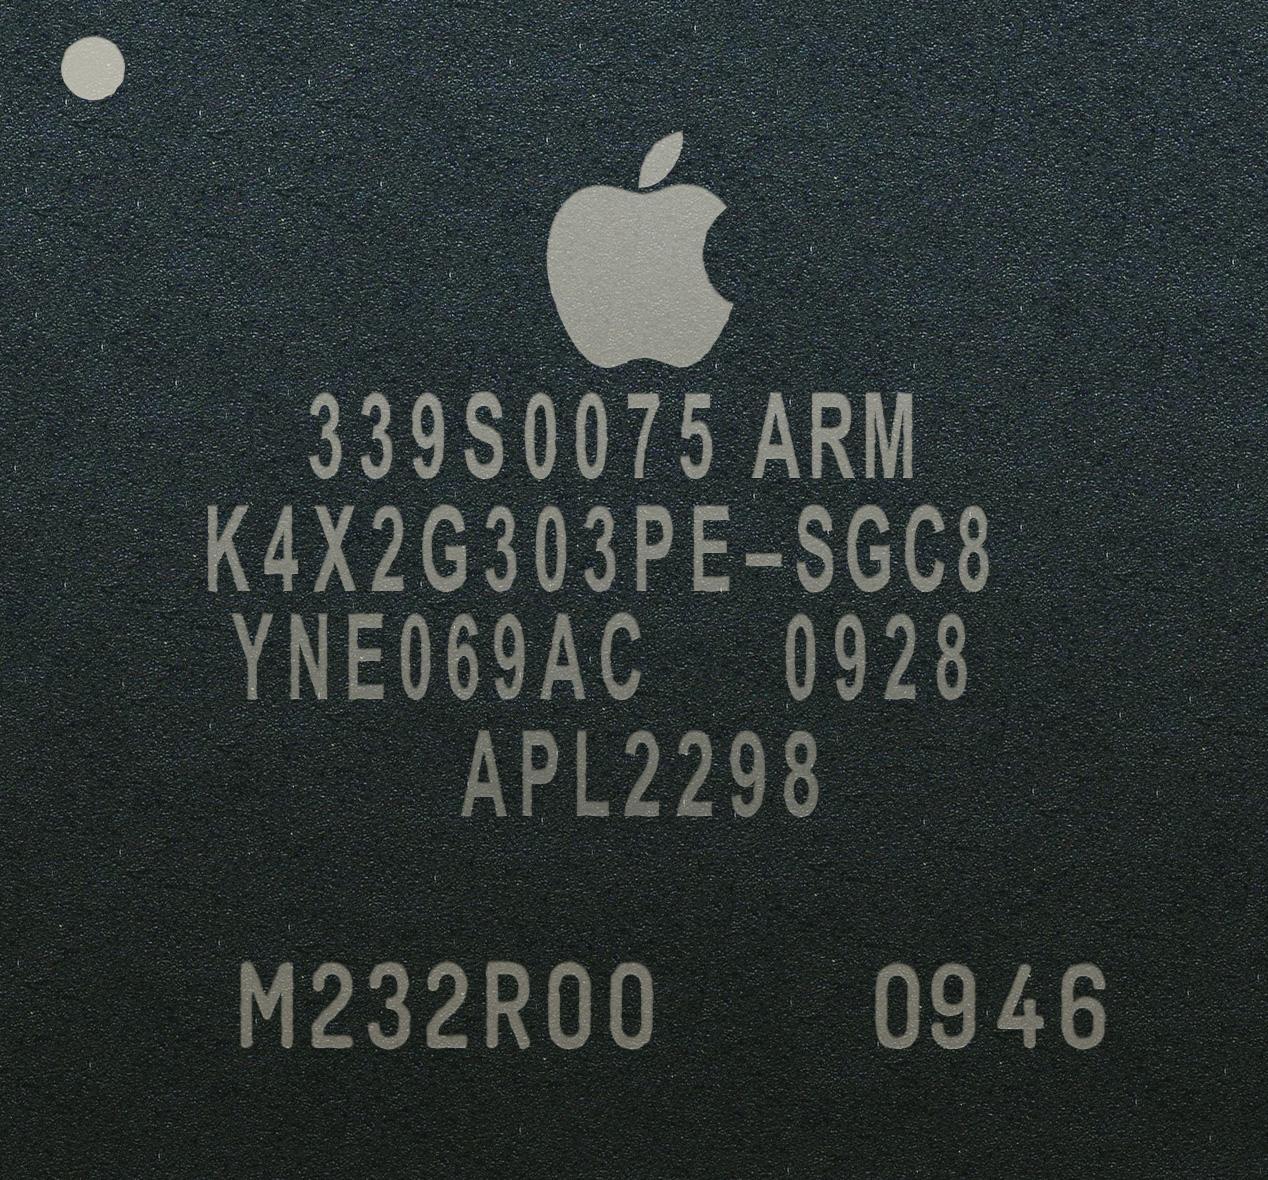 Apple APL2298